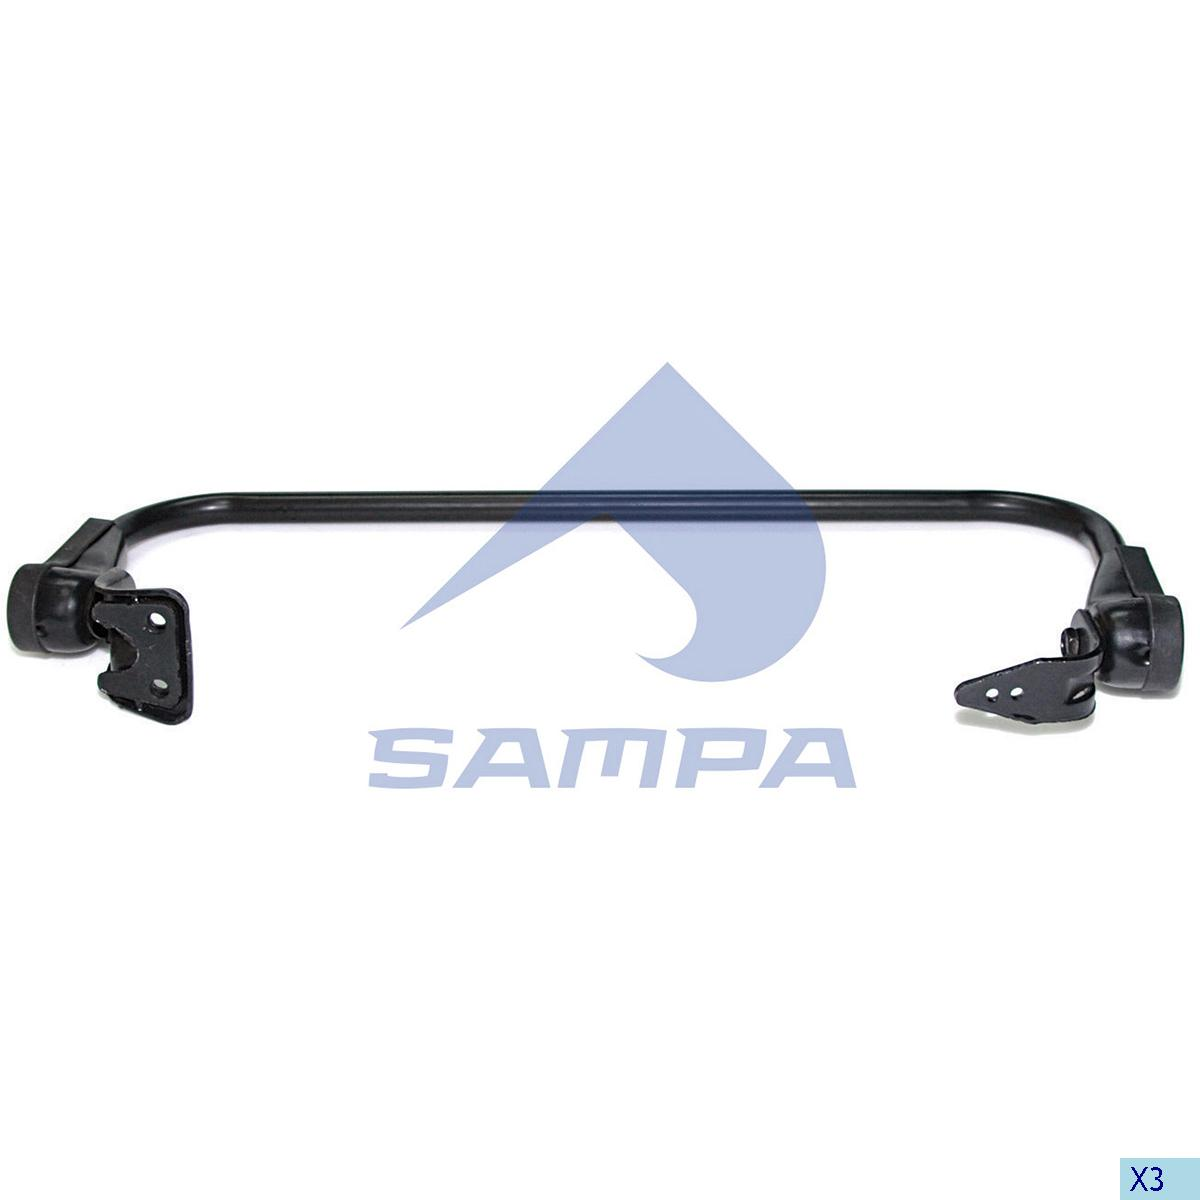 Arm, Mirror, Scania, Cab